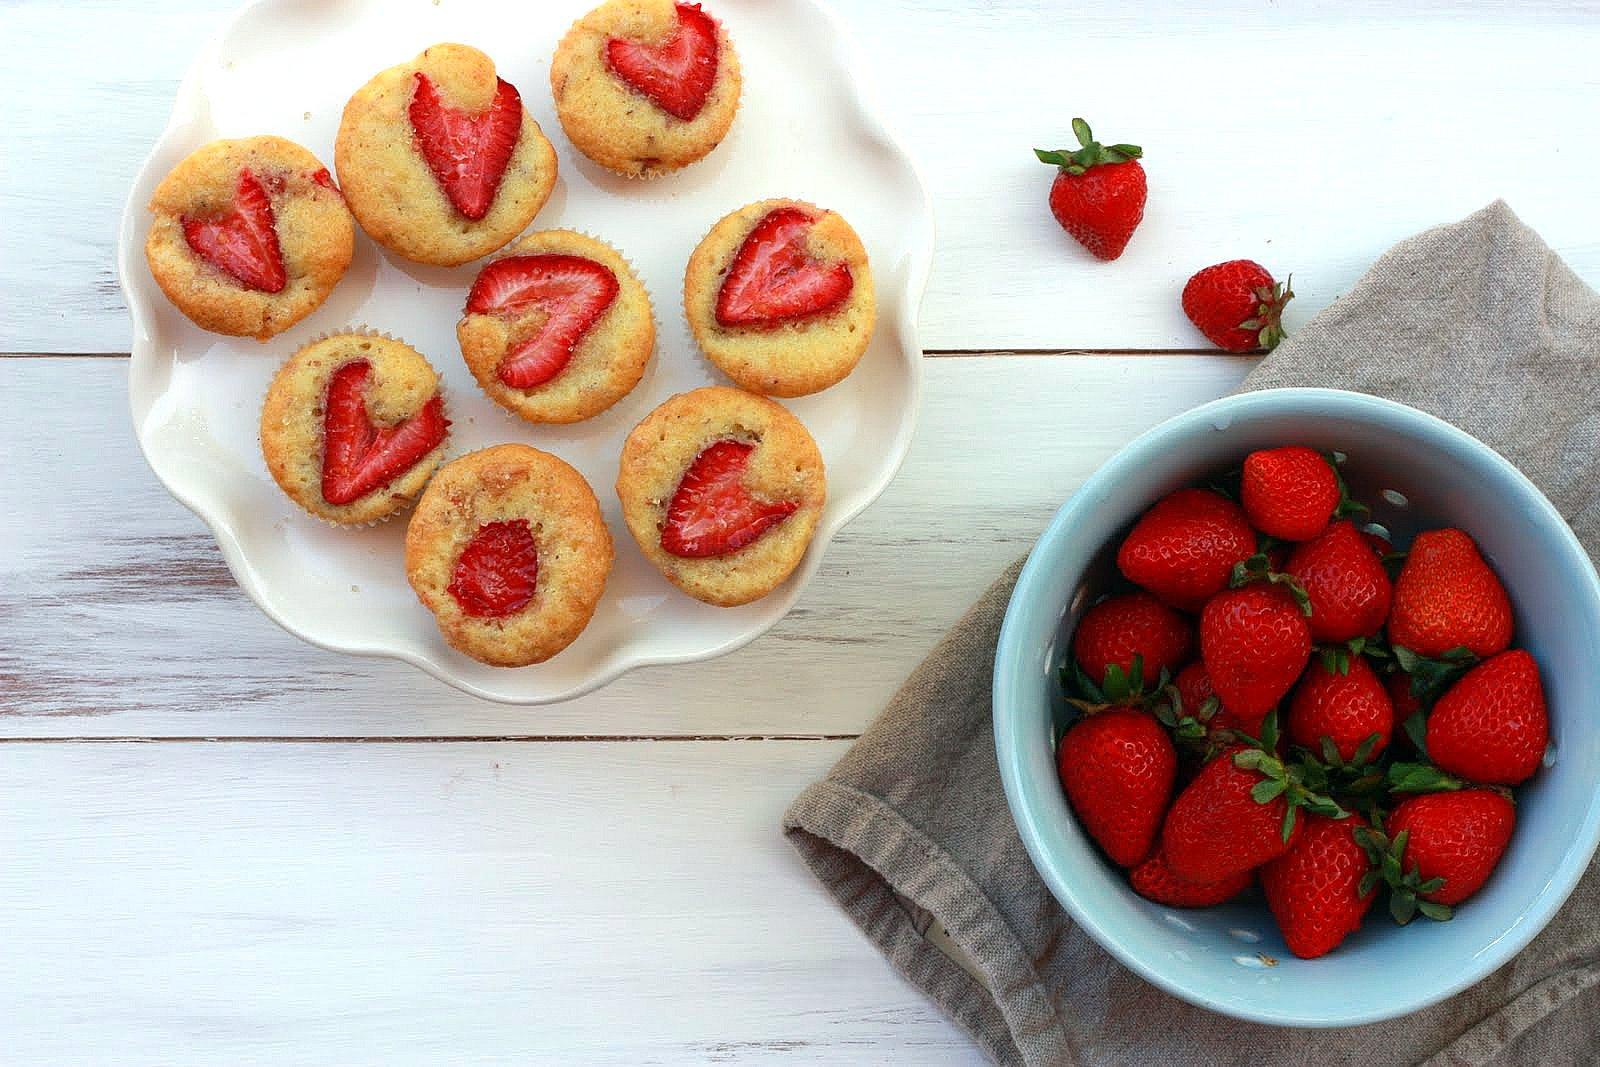 Yummy Mummy Kitchen: Strawberry Almond Olive Oil Muffins